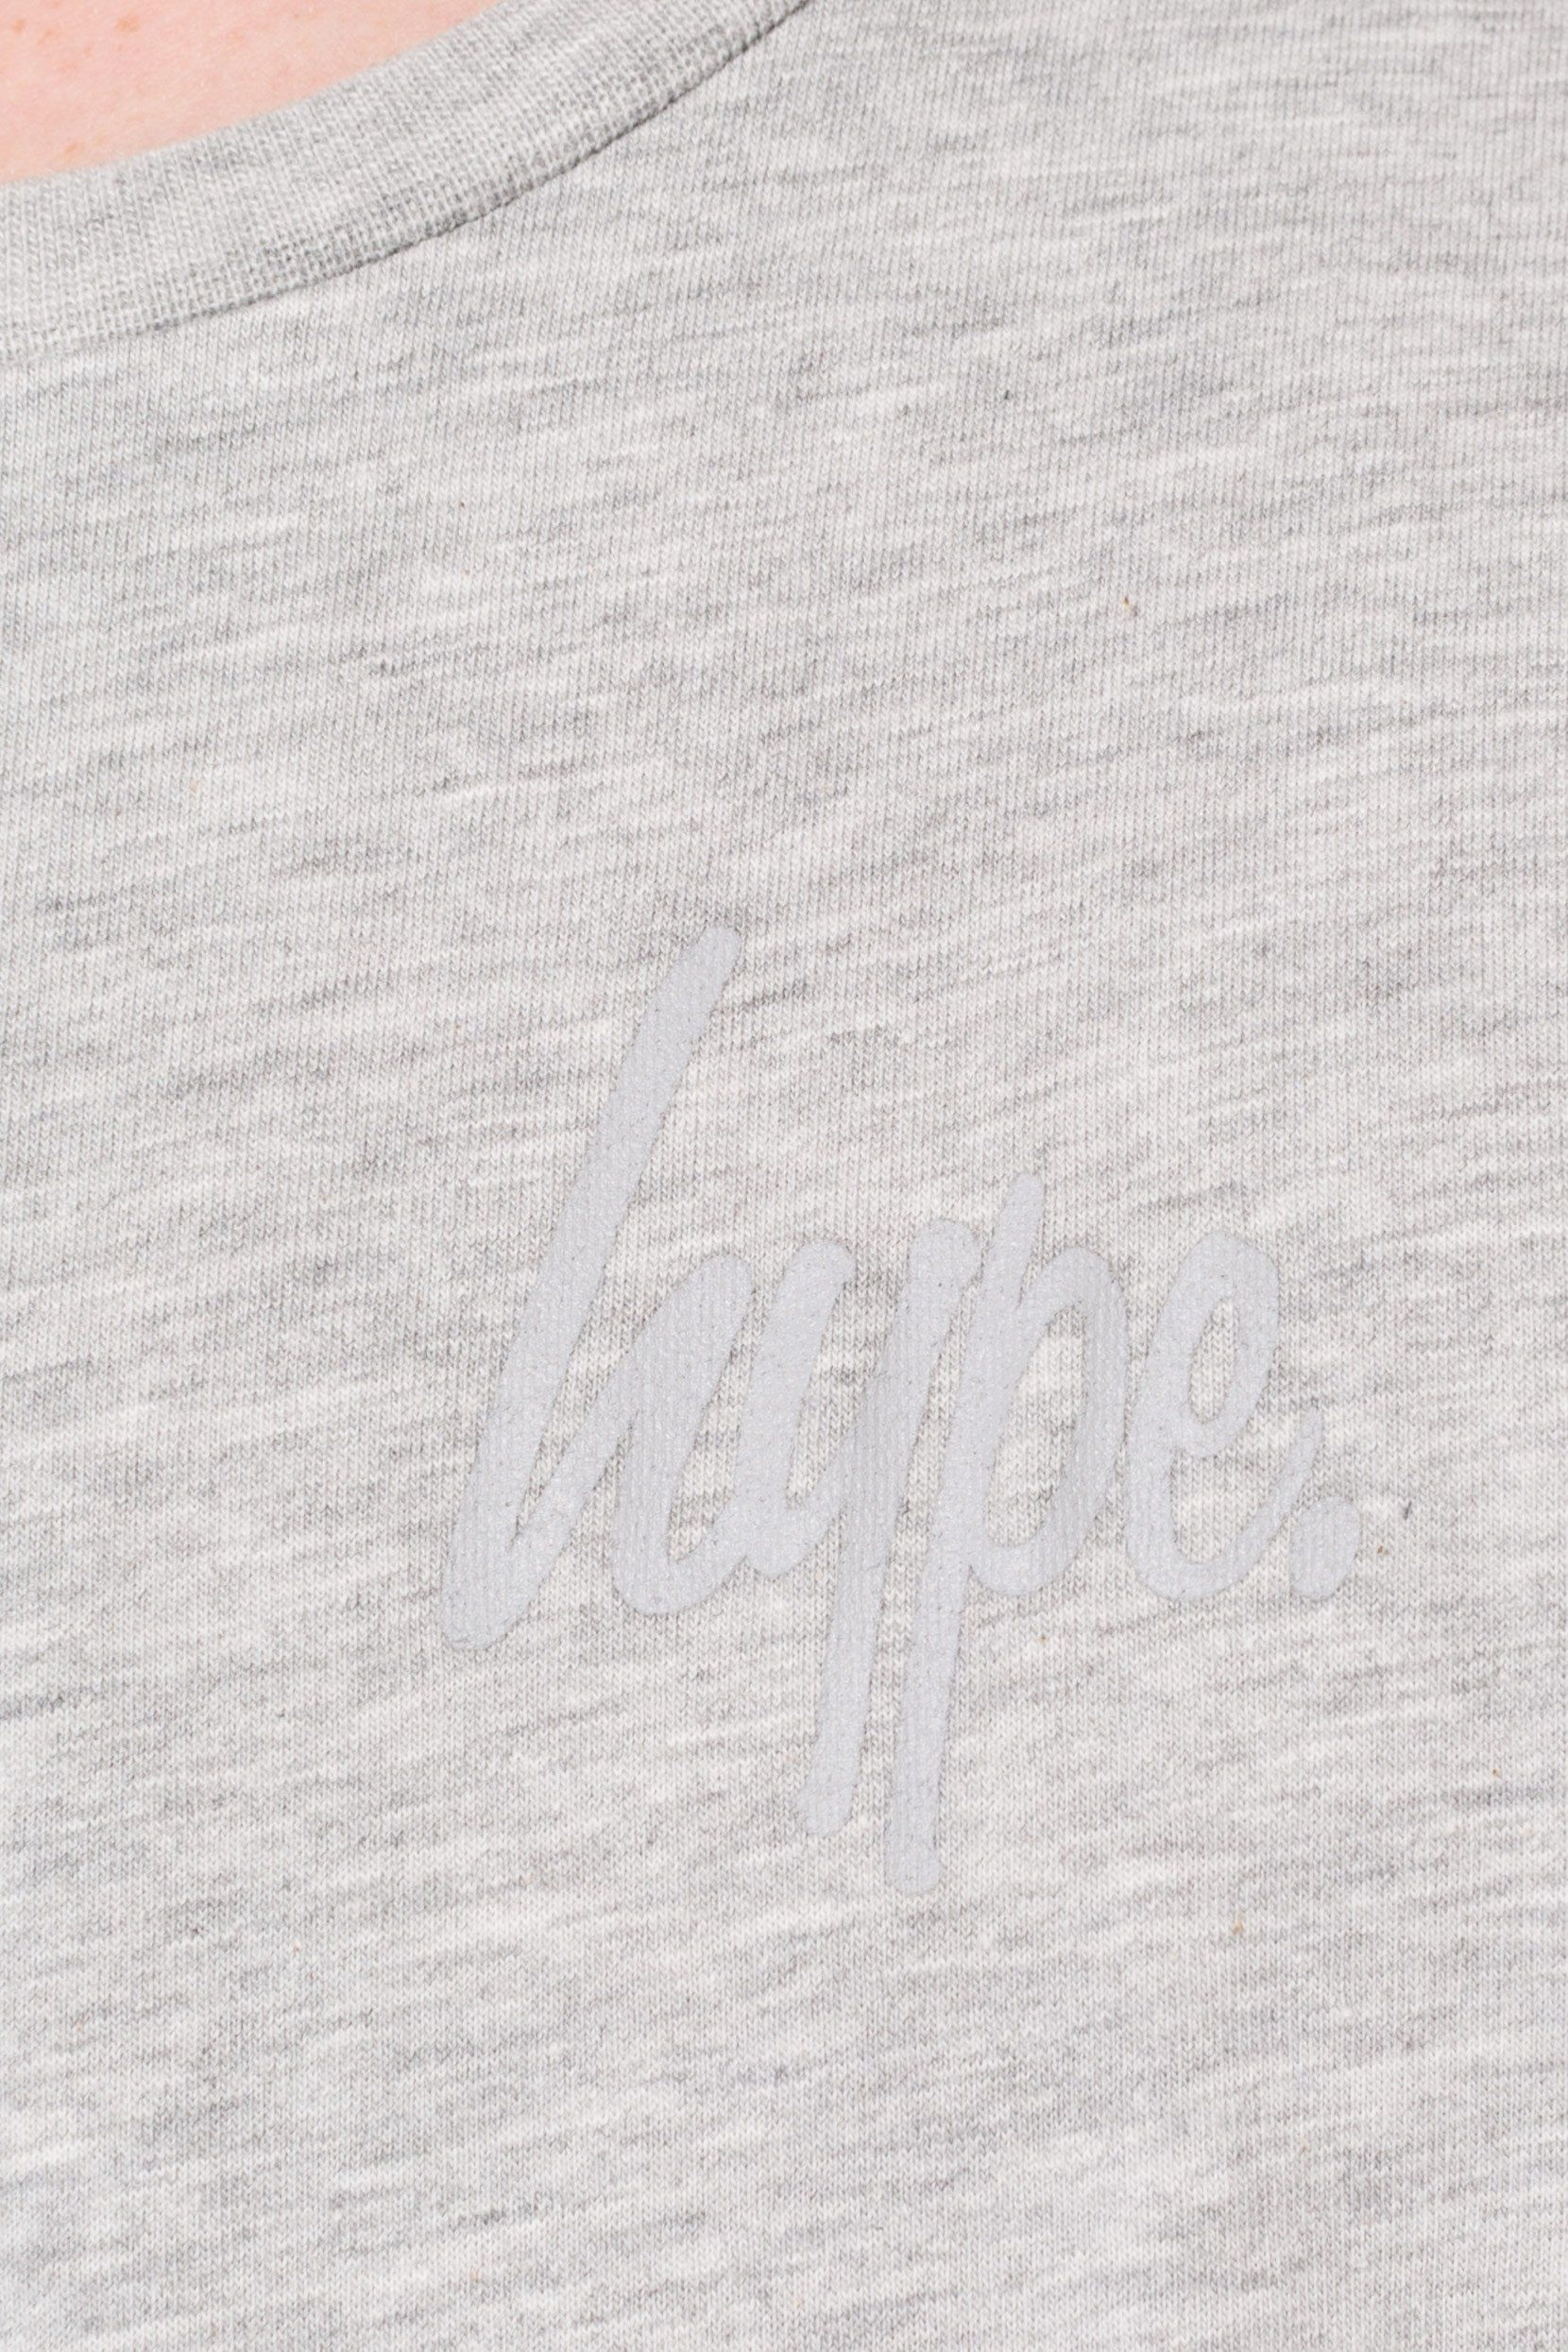 Hype Grey Staple Kids Multi Pack T-Shirts